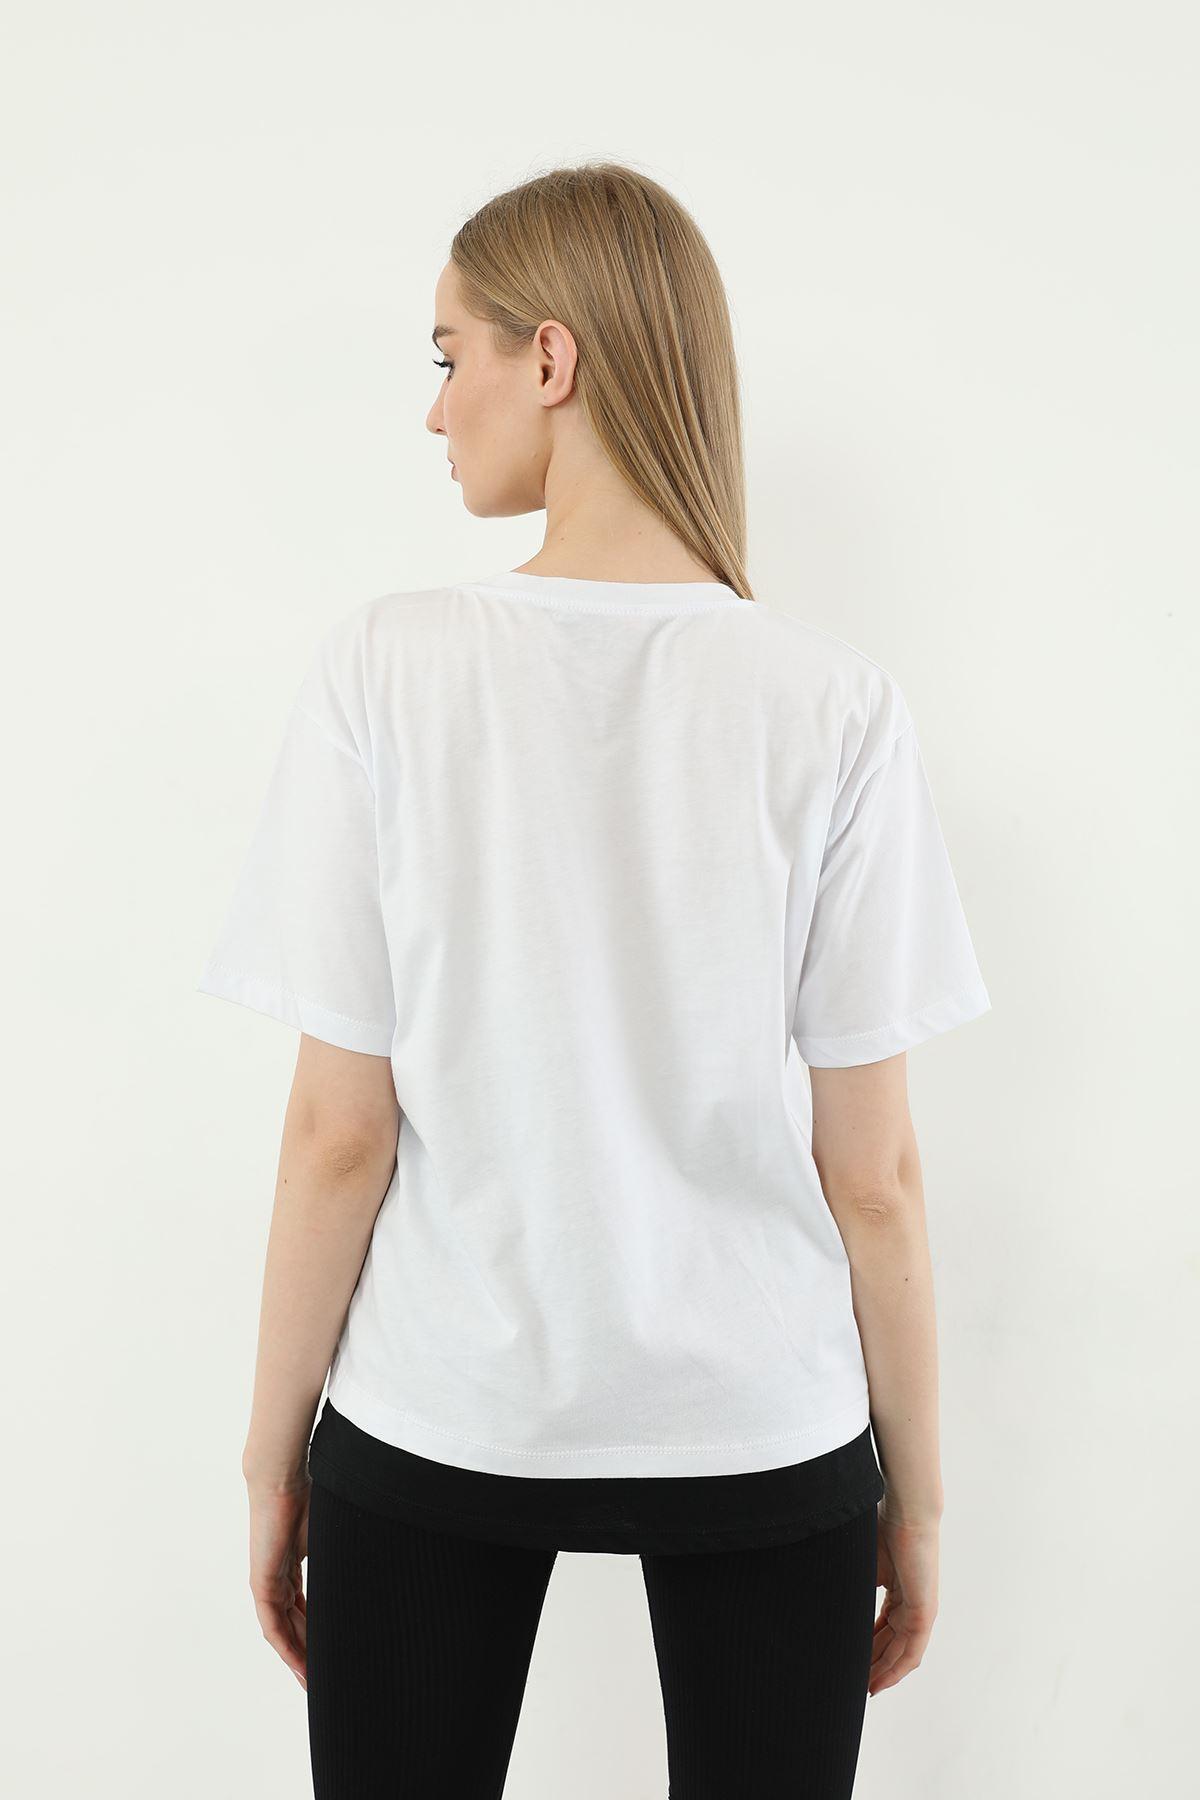 Recycle Baskılı T-shirt-Ekru